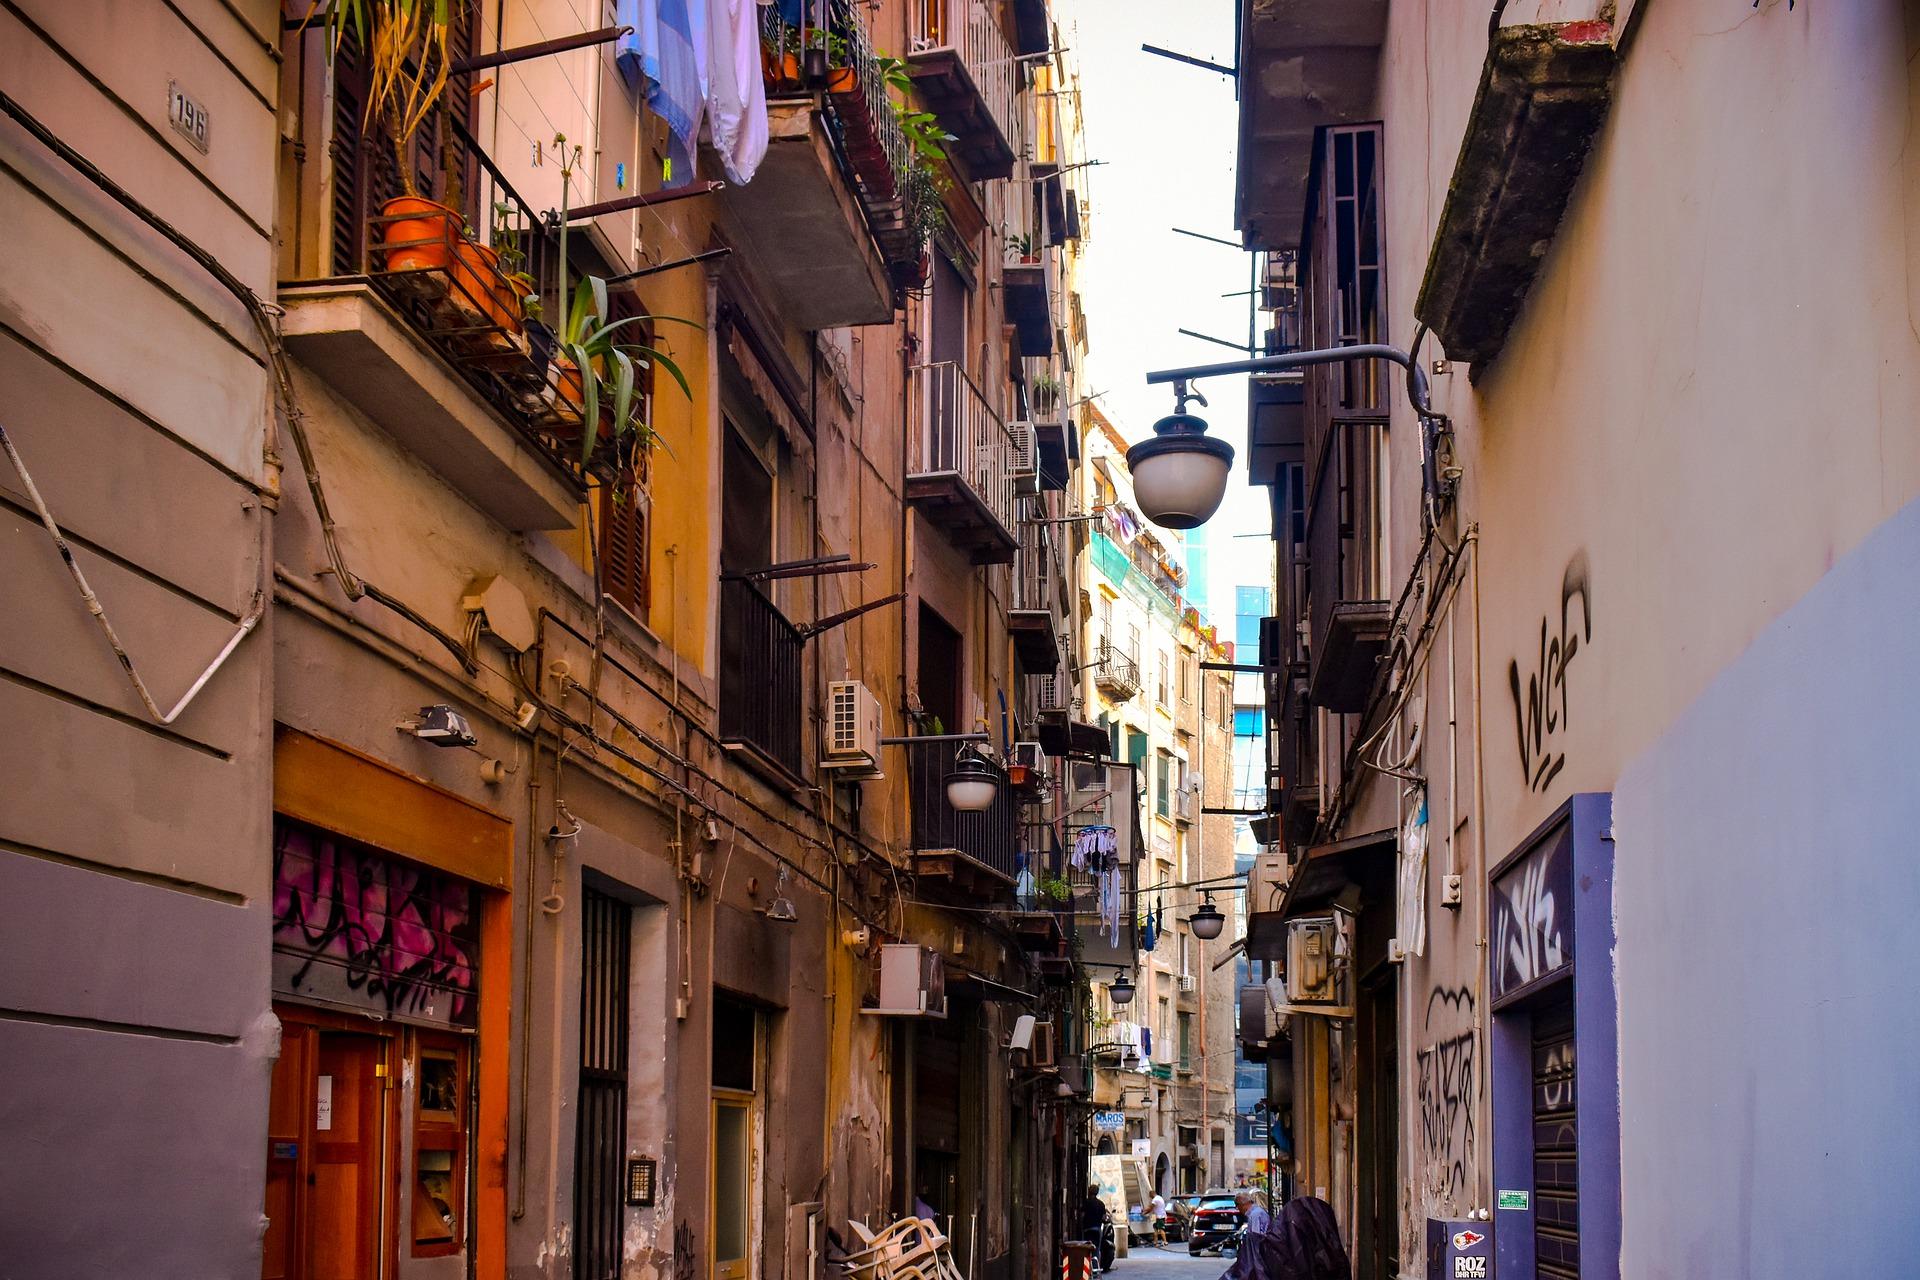 Napoli strade